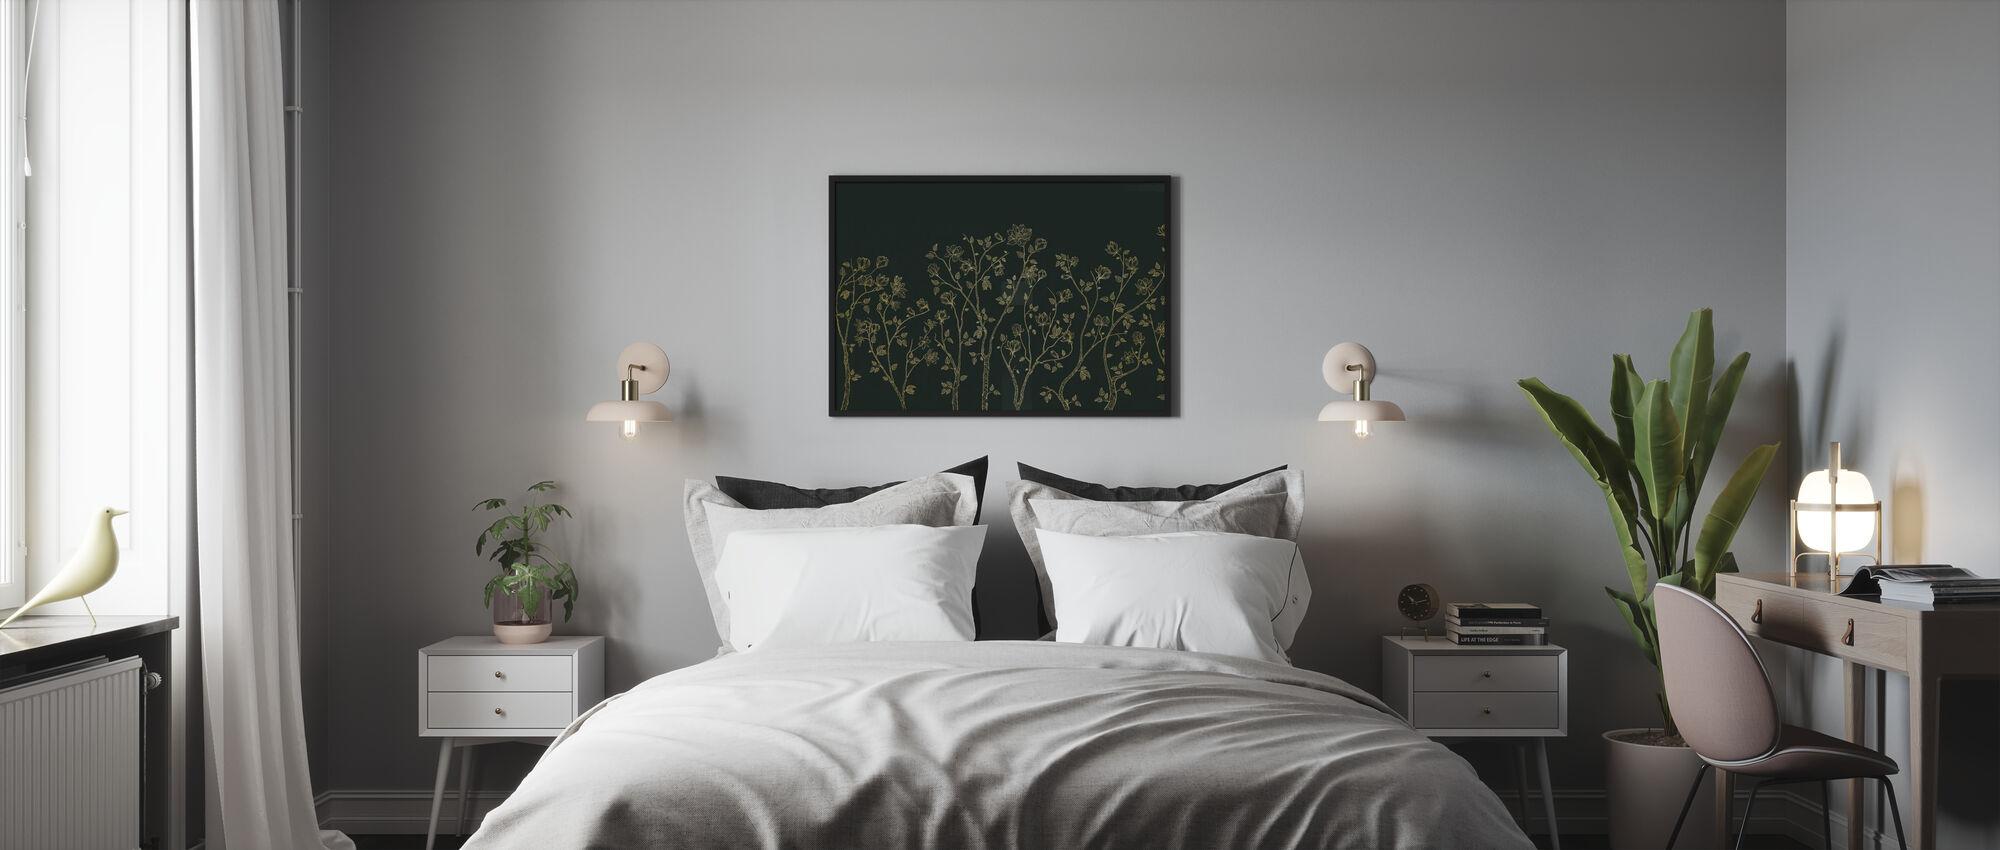 Crescent Vegetative - Green - Poster - Bedroom